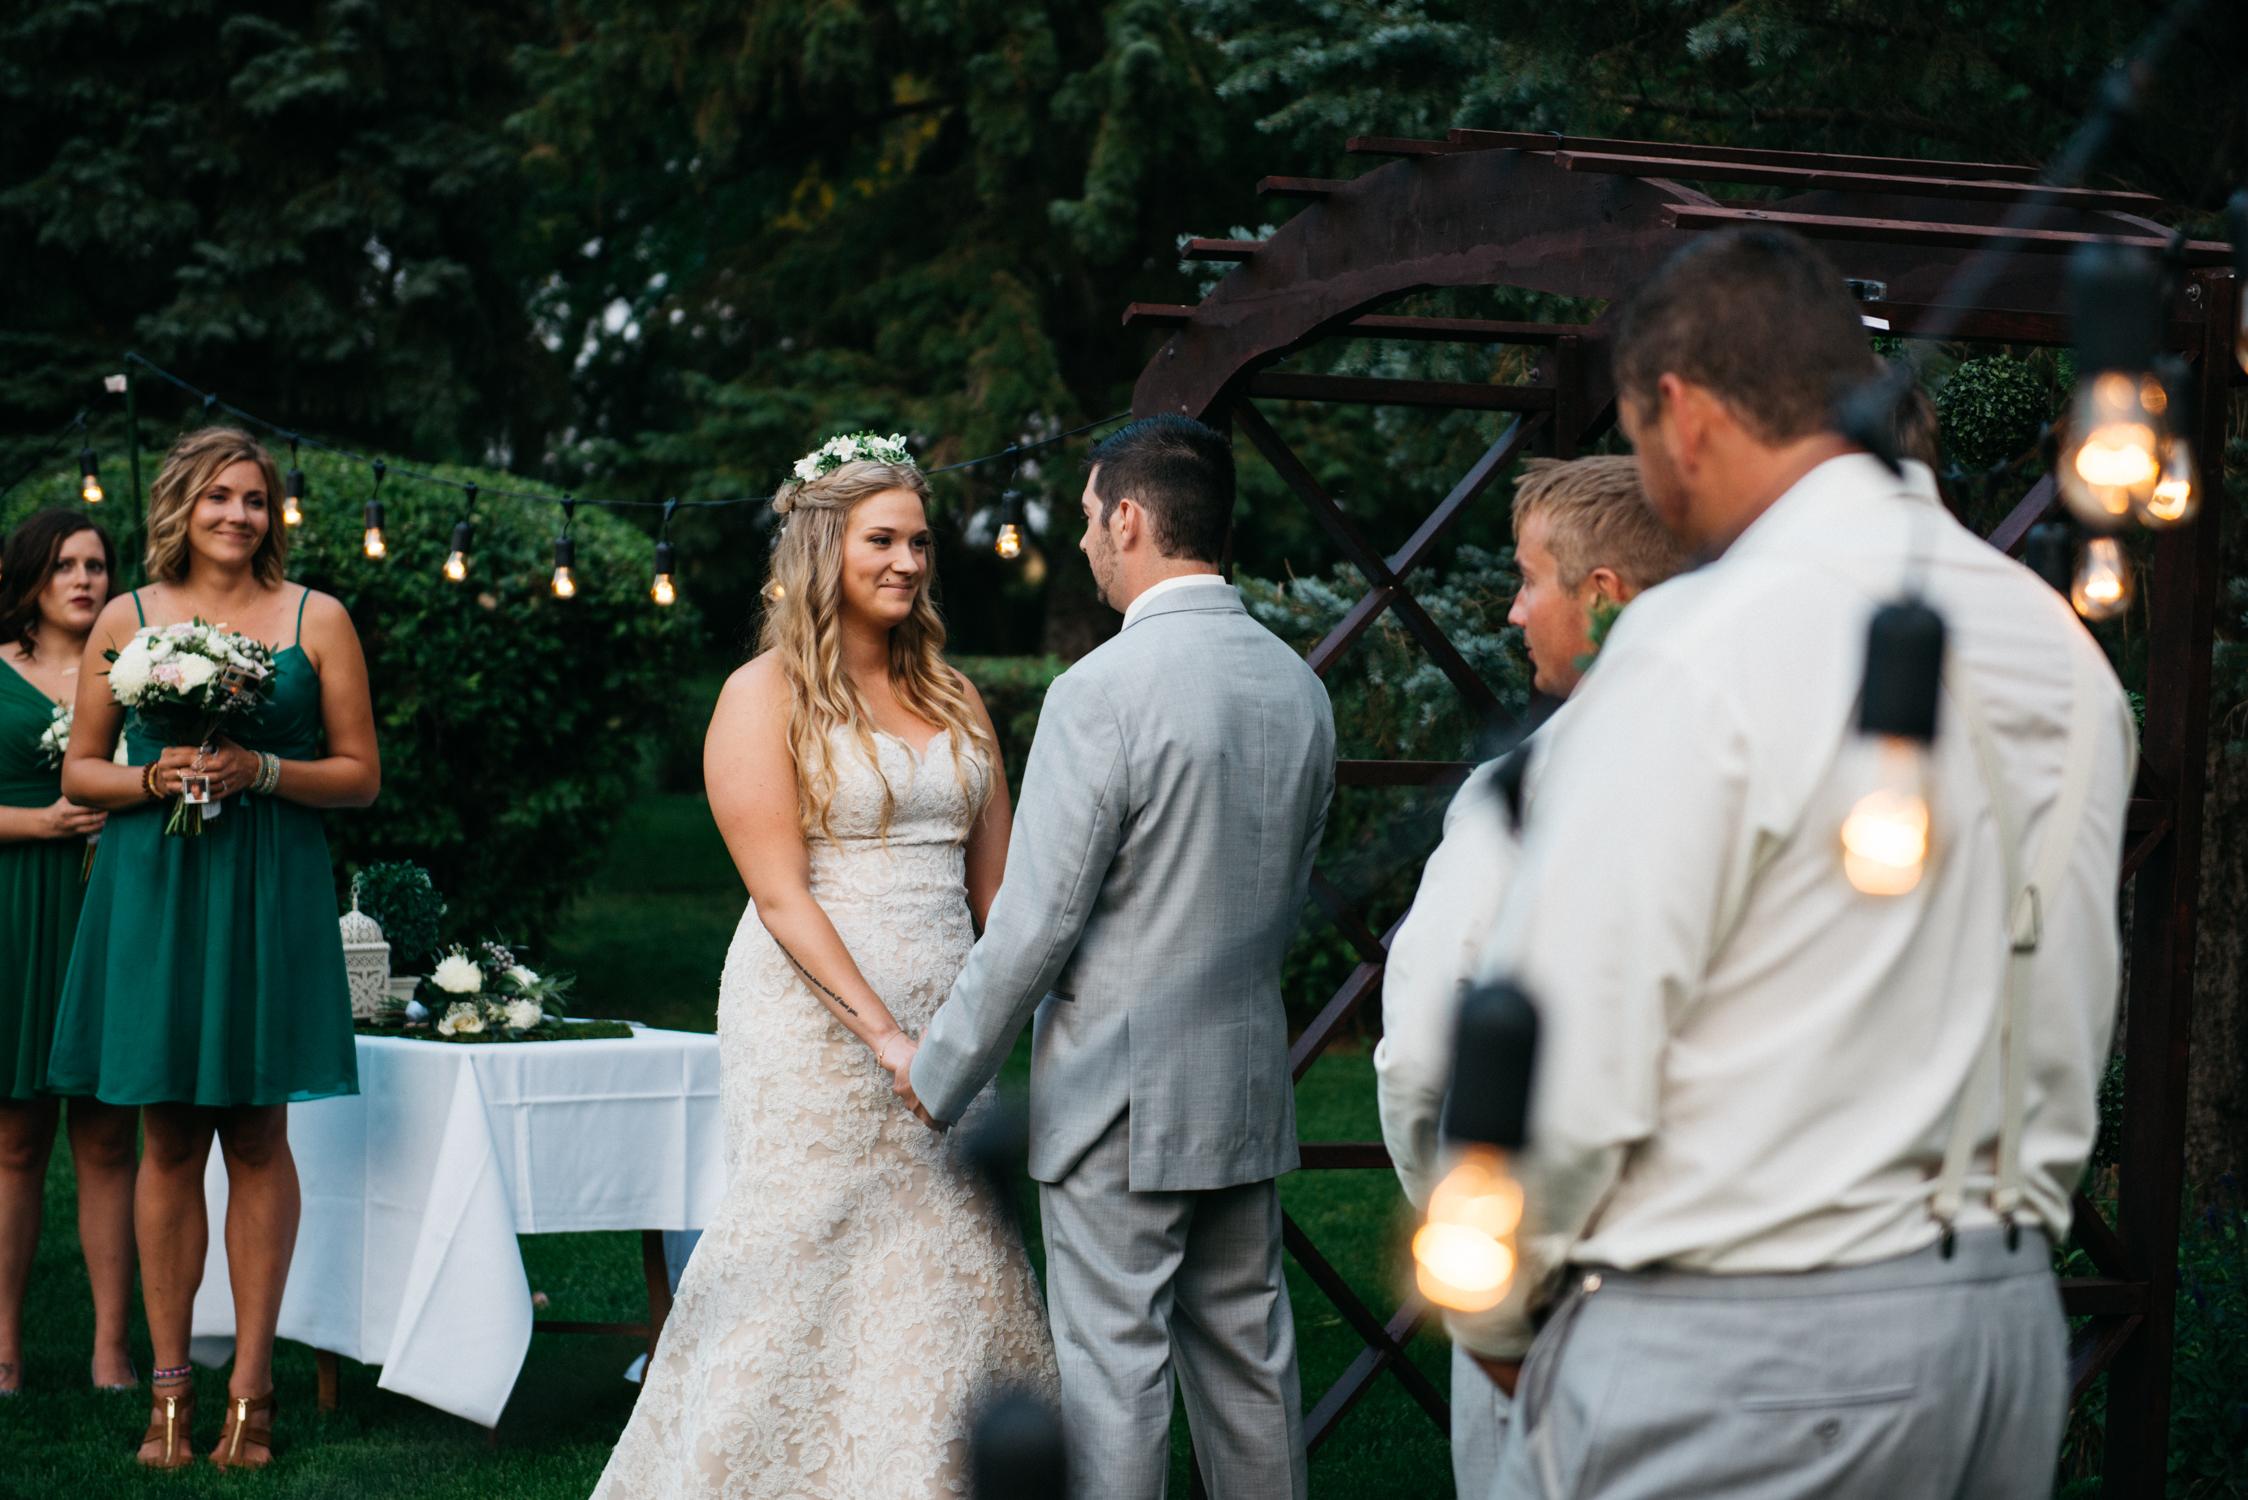 054_saskatoon_saskatchewan_small_town_wedding.jpg